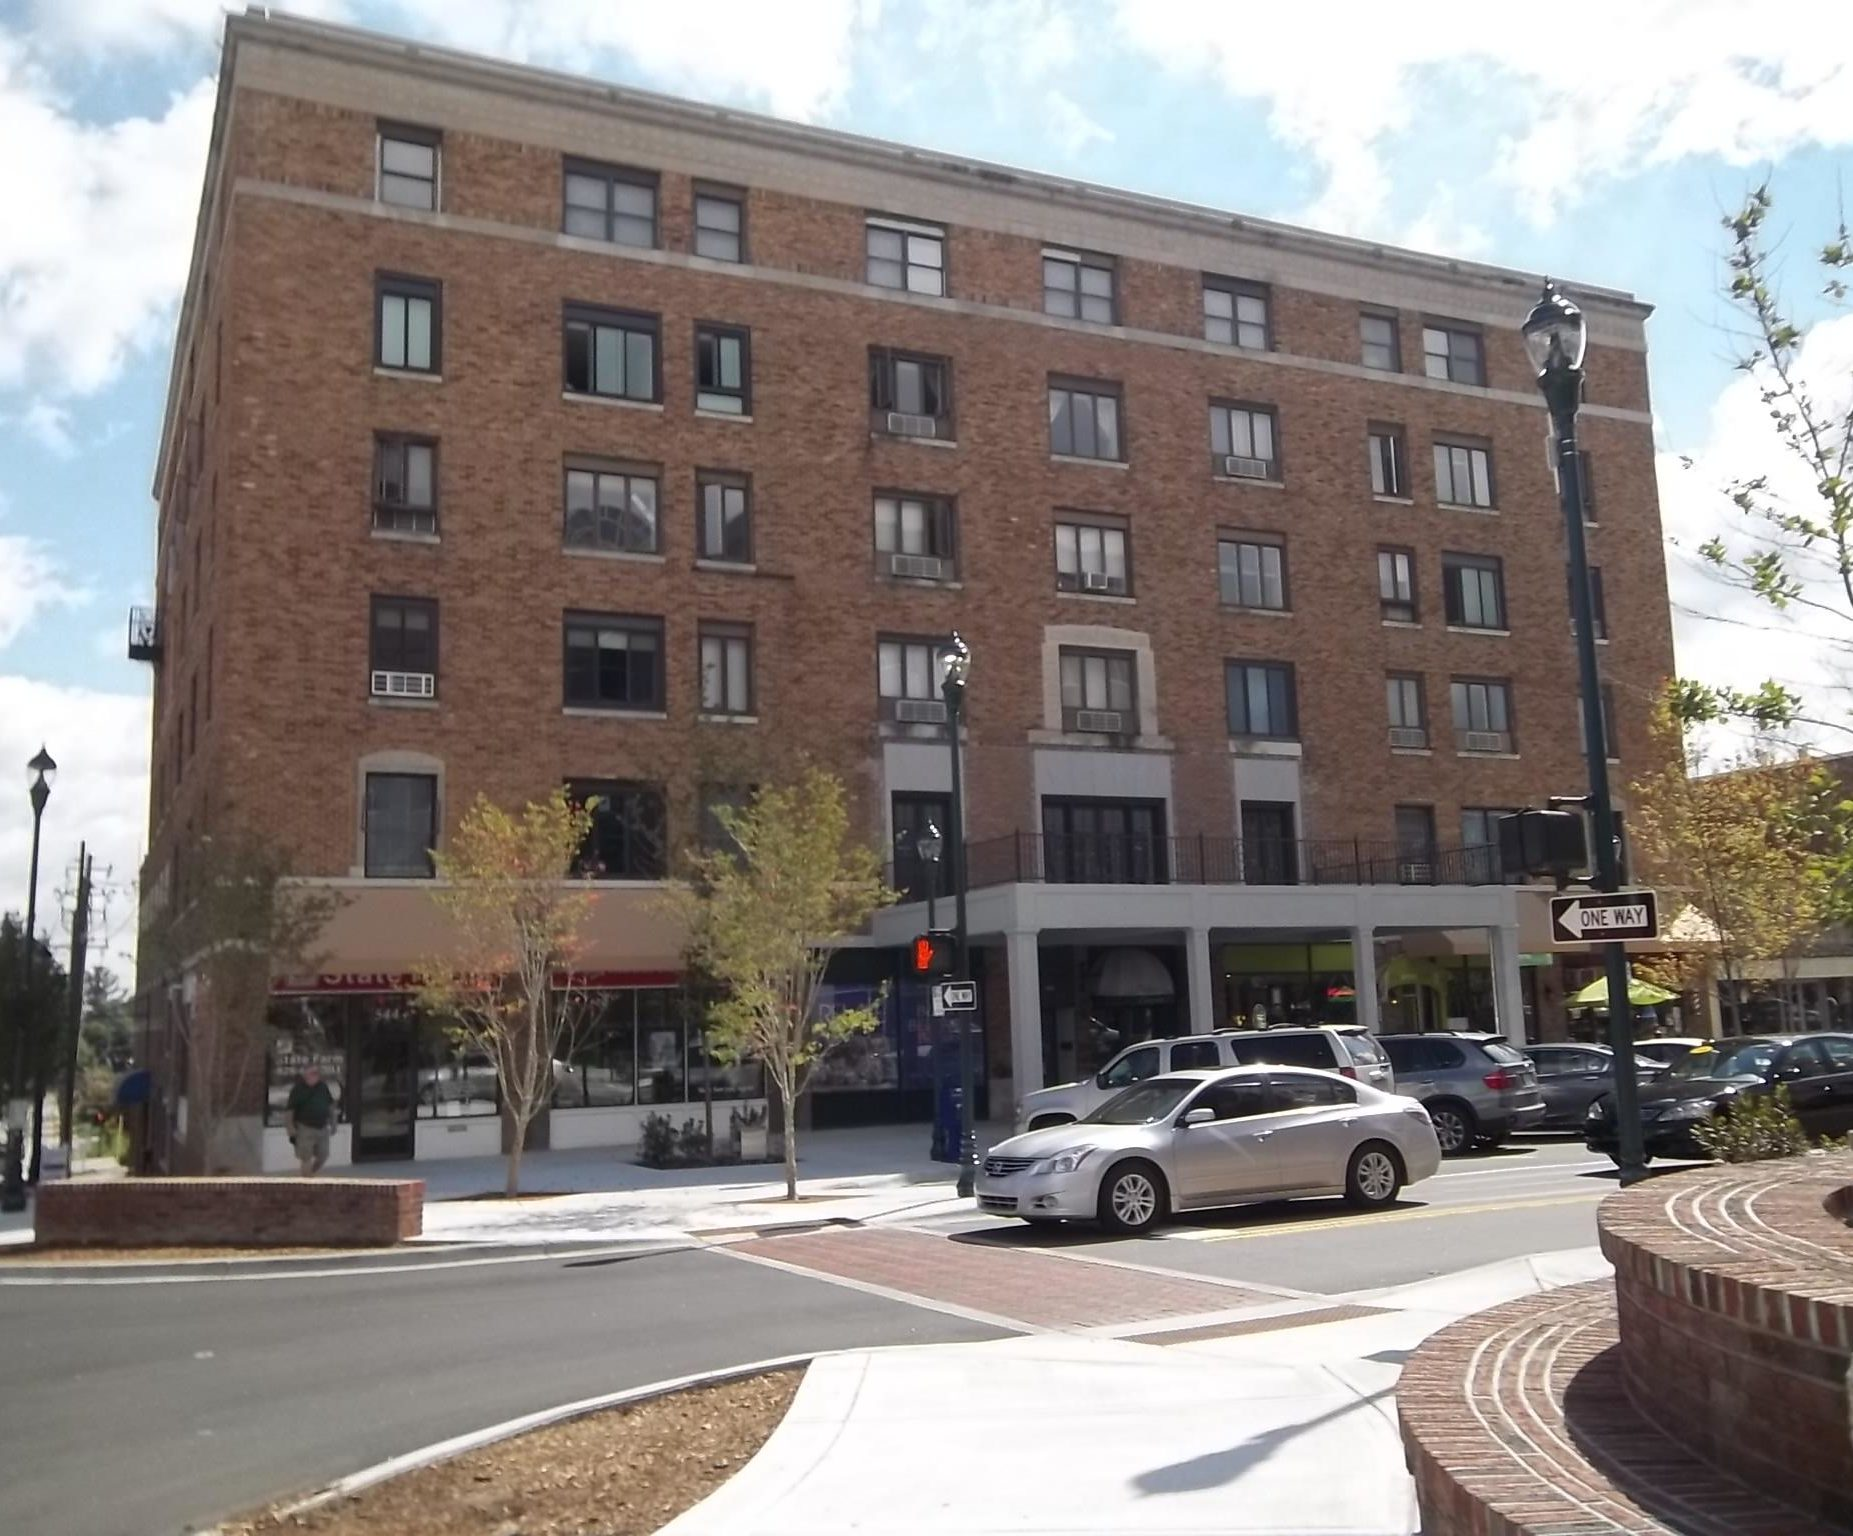 Skyland Hotel, Hendersonville   221393   EMPORIS